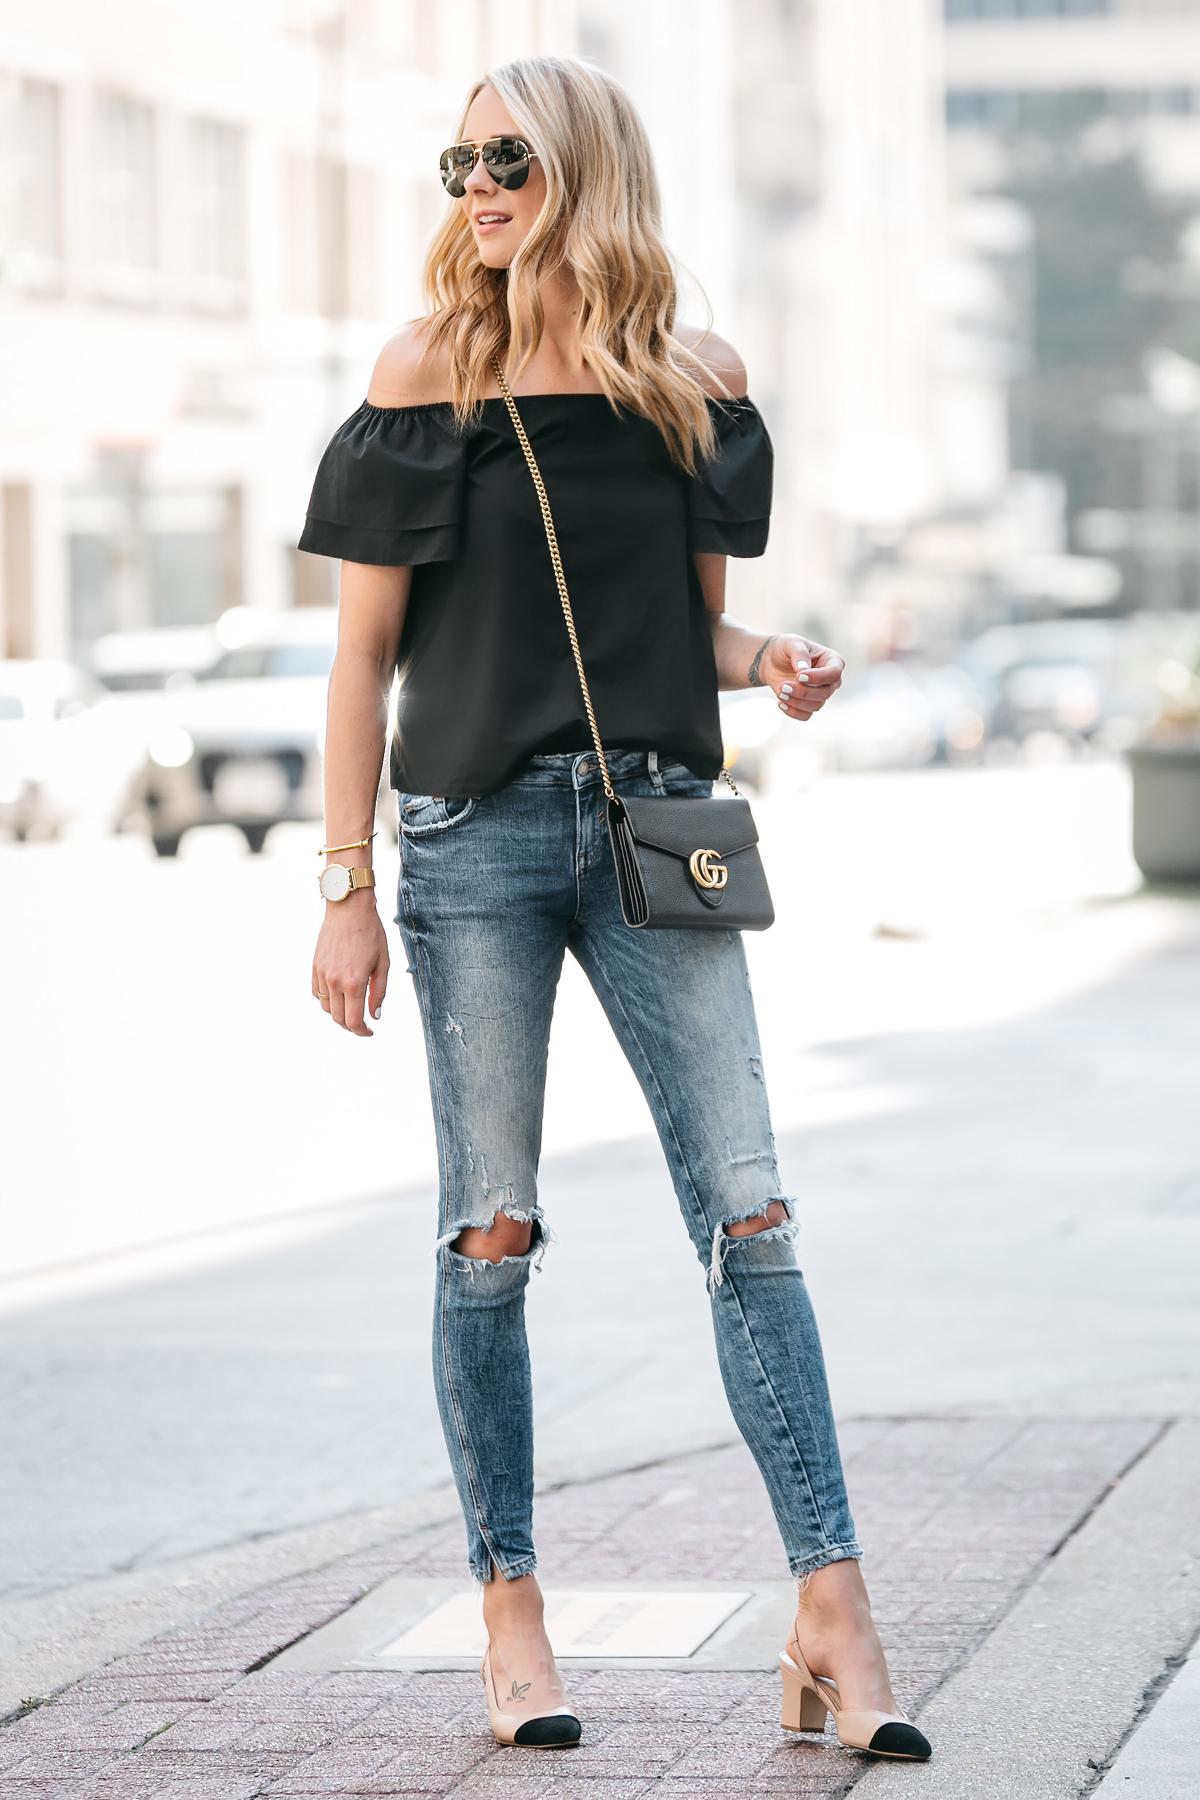 jeans jackson street blogger chanel outfit skinny outfits shoulder dallas hear sleeve short ripped pilkington emma jane summer mode heels